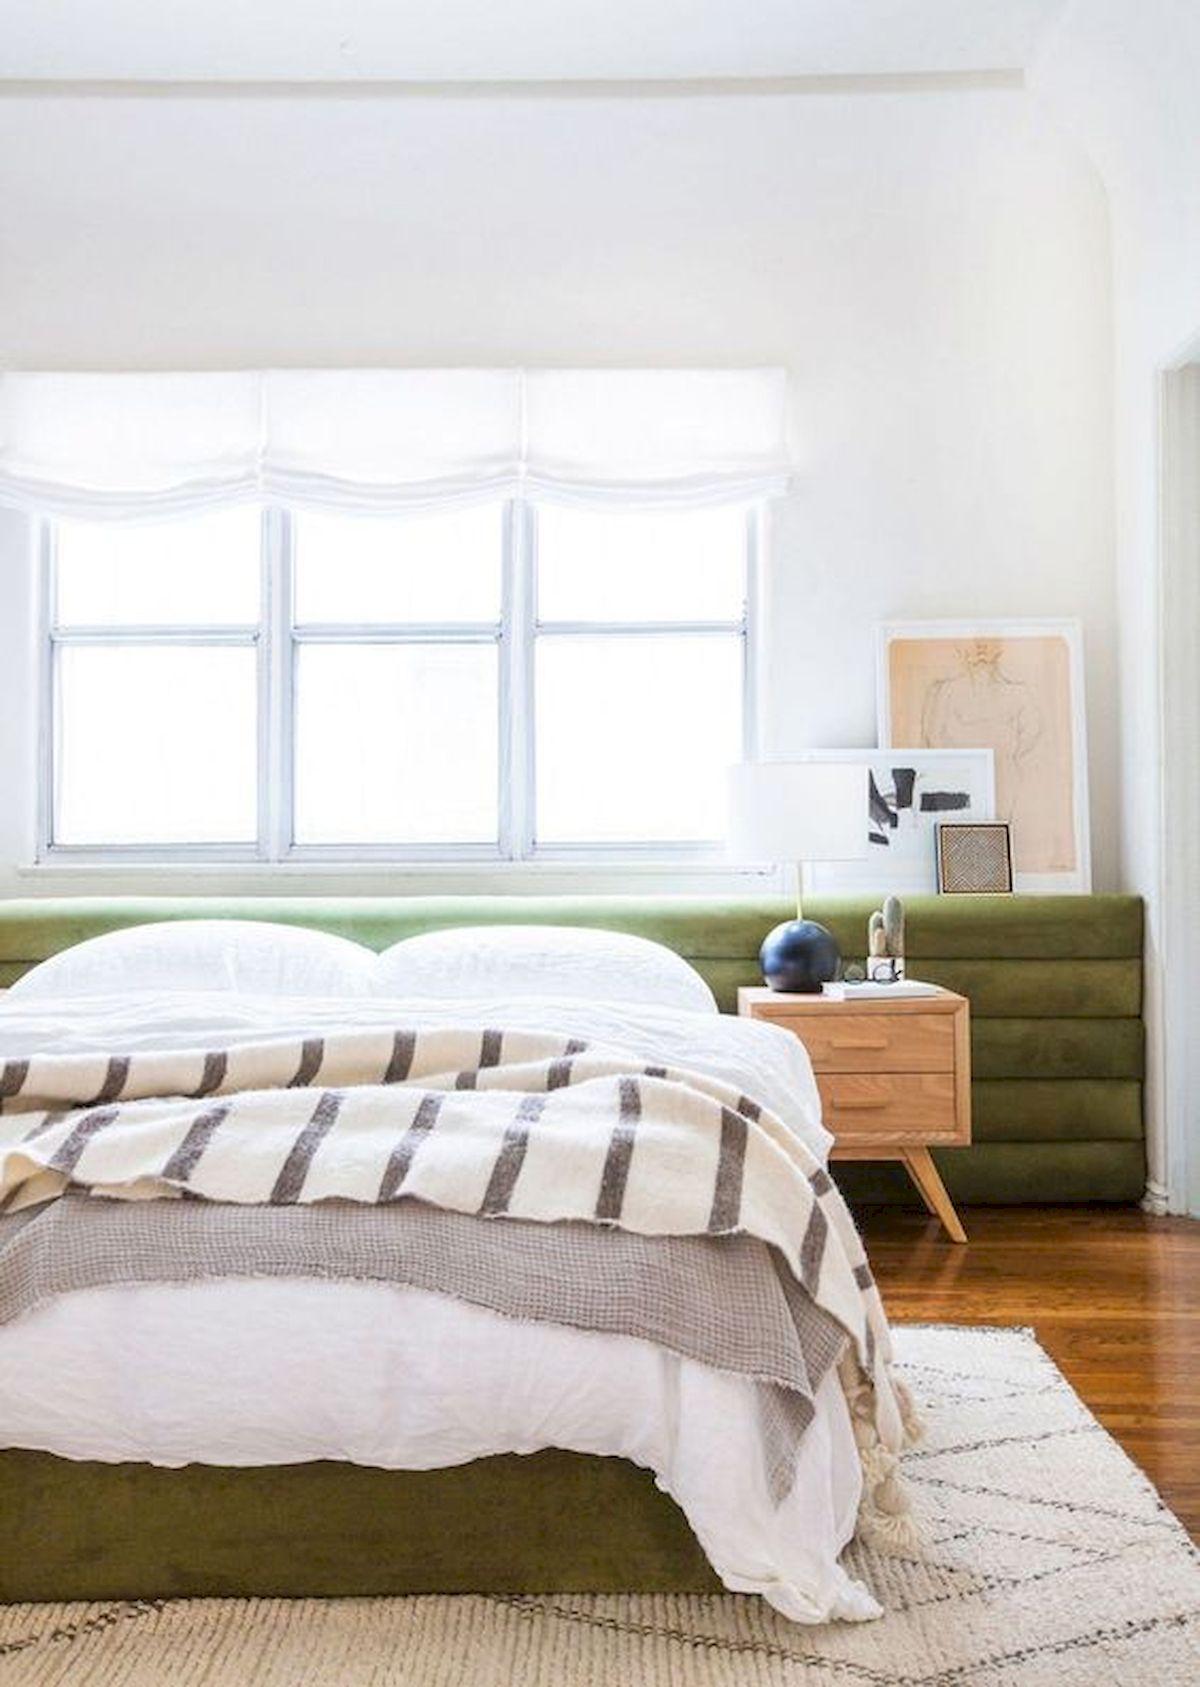 40 Amazing Farmhouse Boho Bedroom Design And Decor Ideas (11)